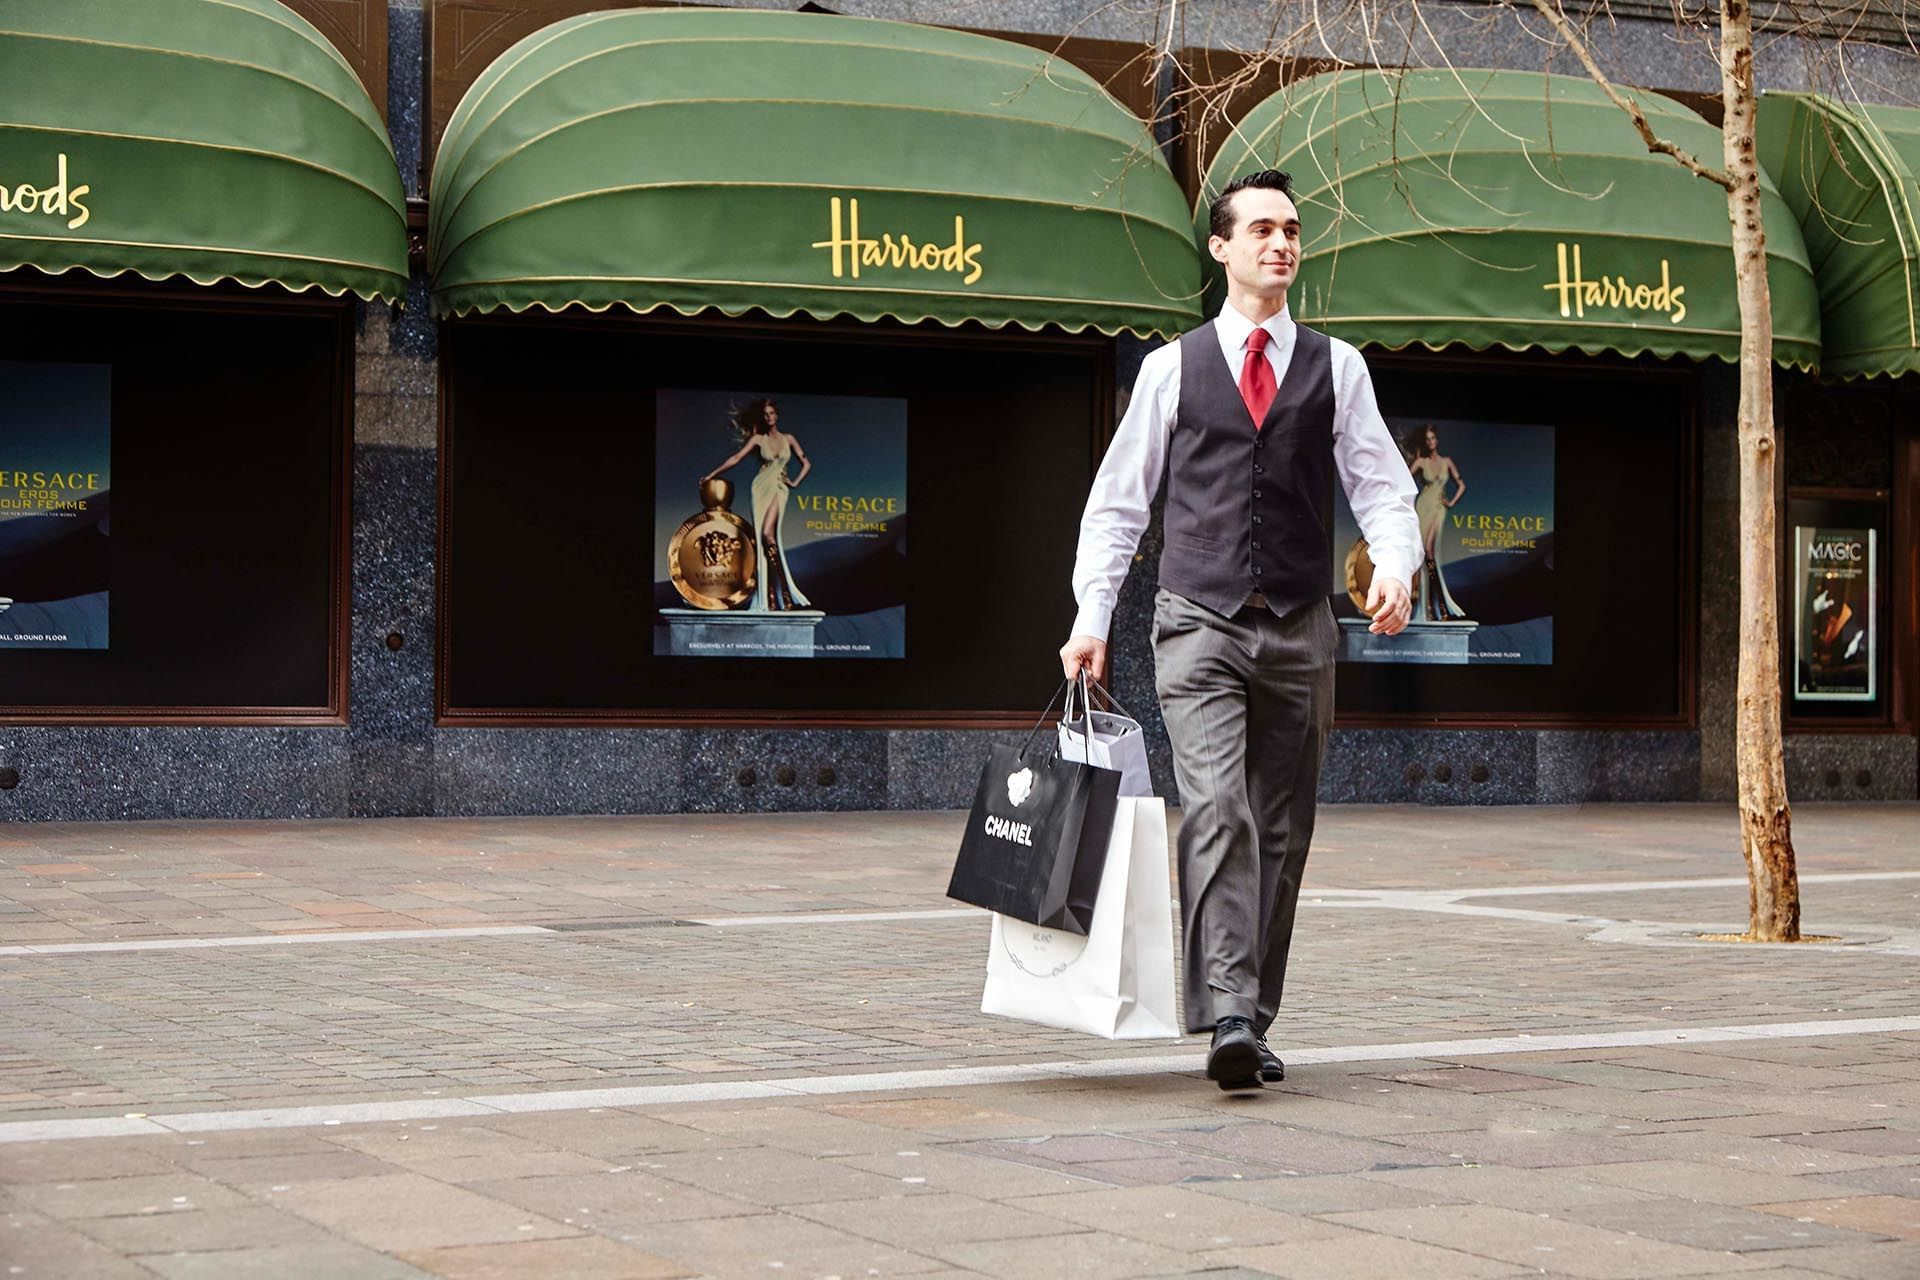 Concierge outside Harrods